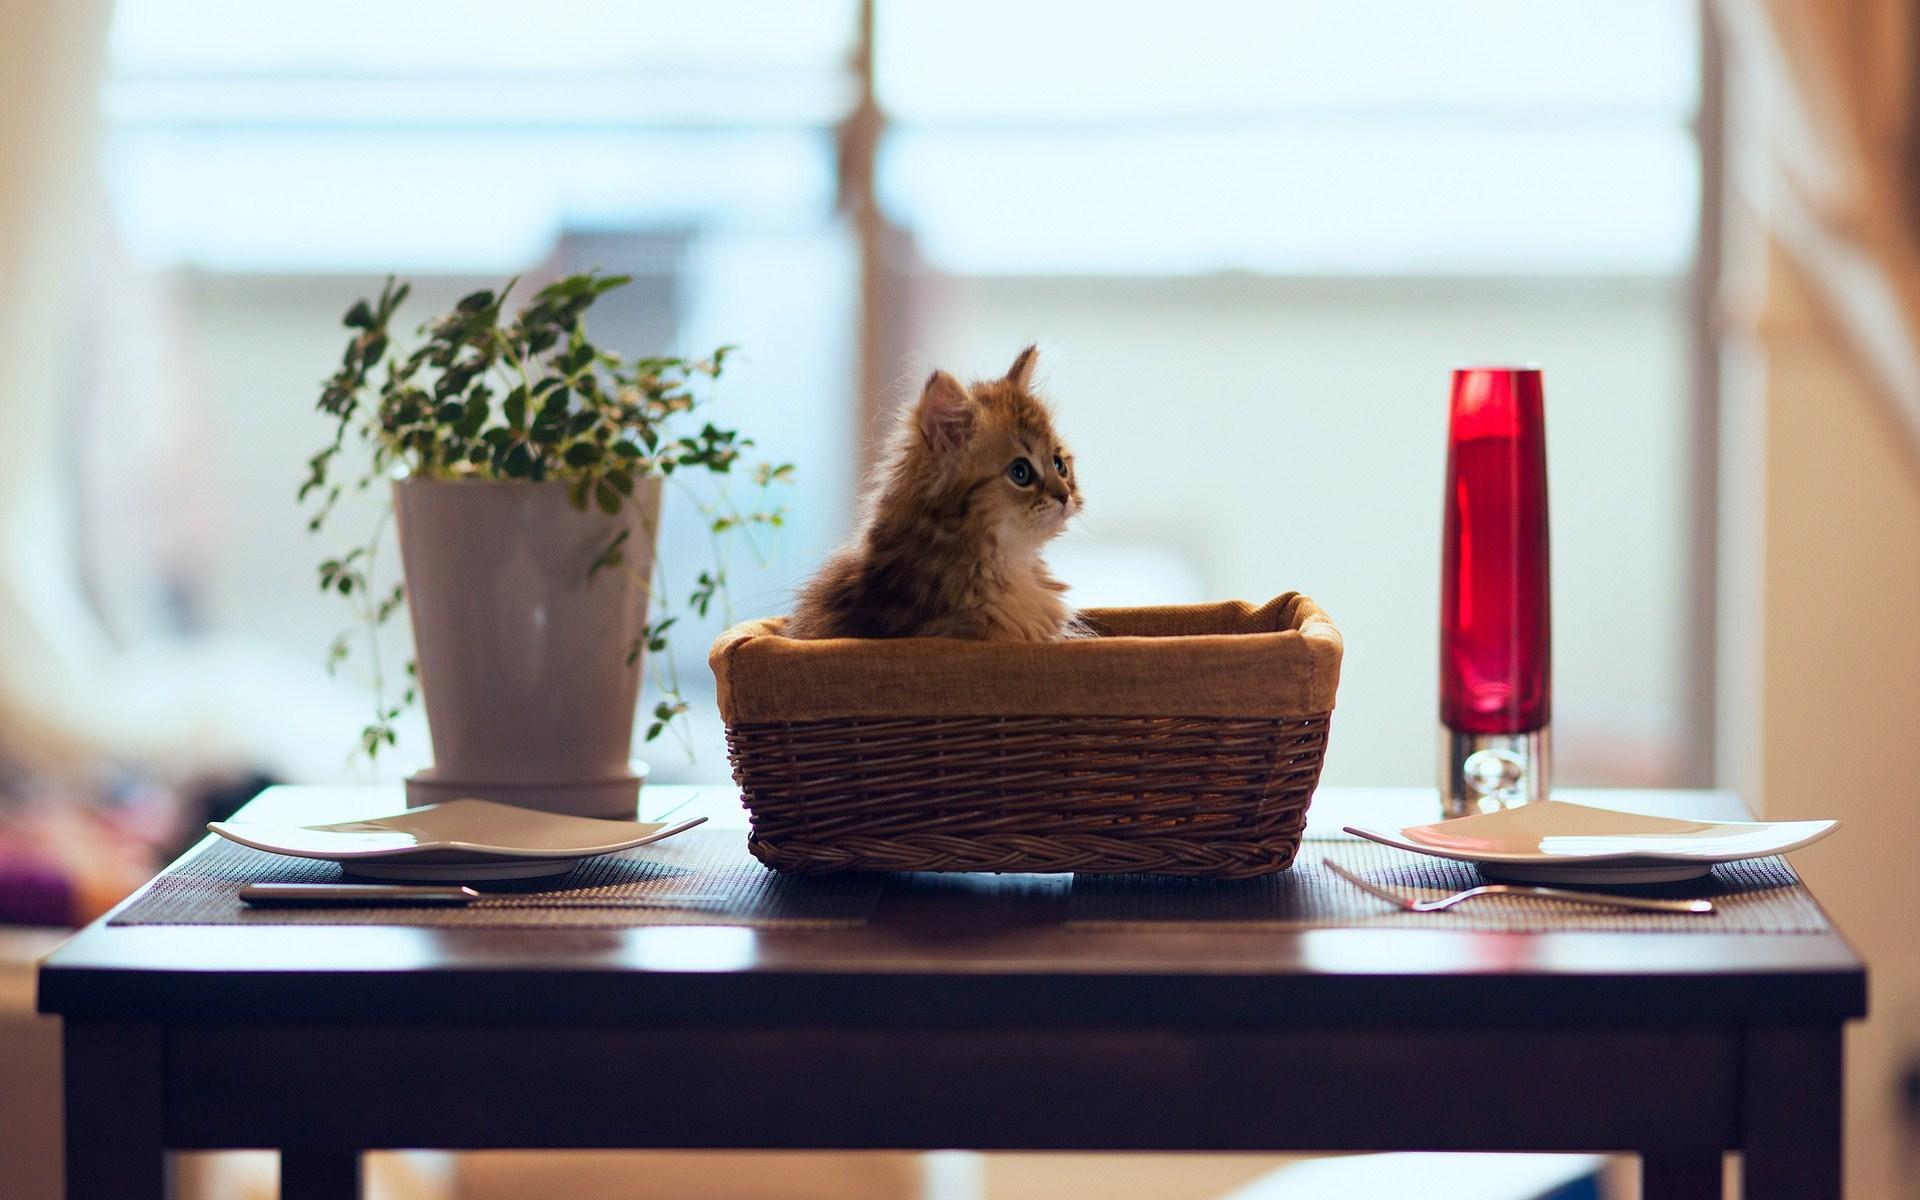 sweet kittens wallpapers